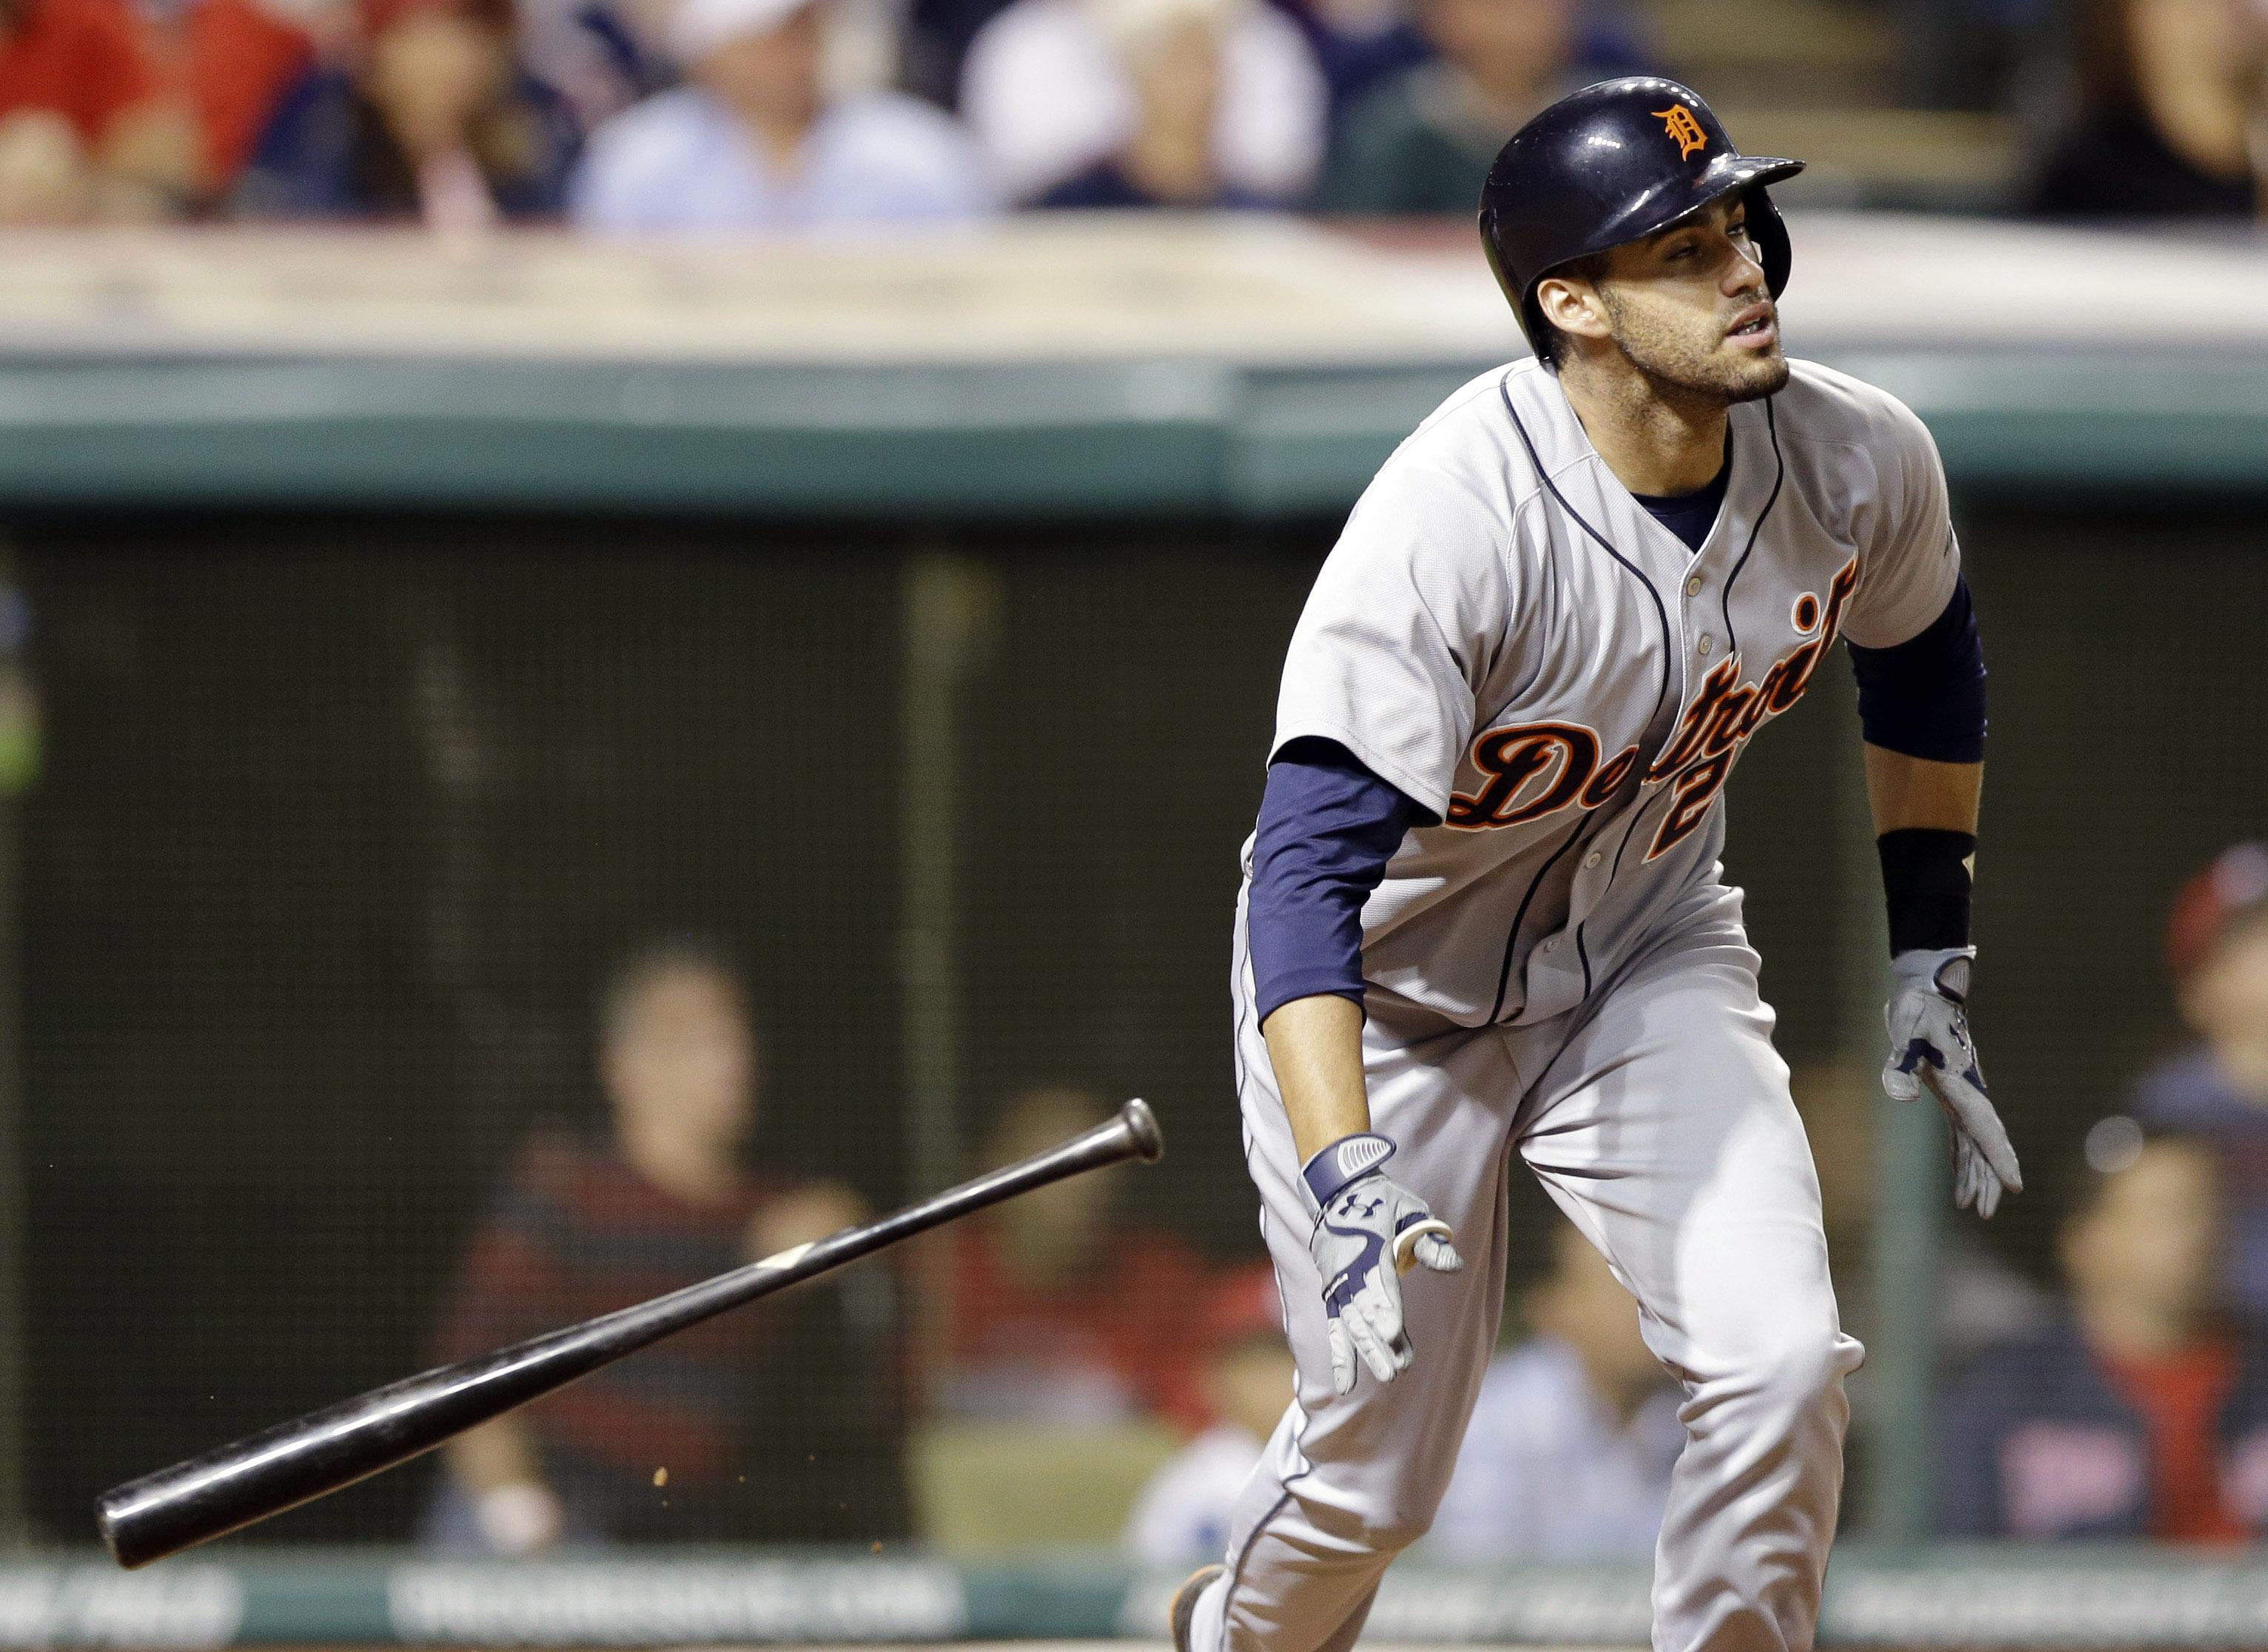 Tigers_martinez_baseball